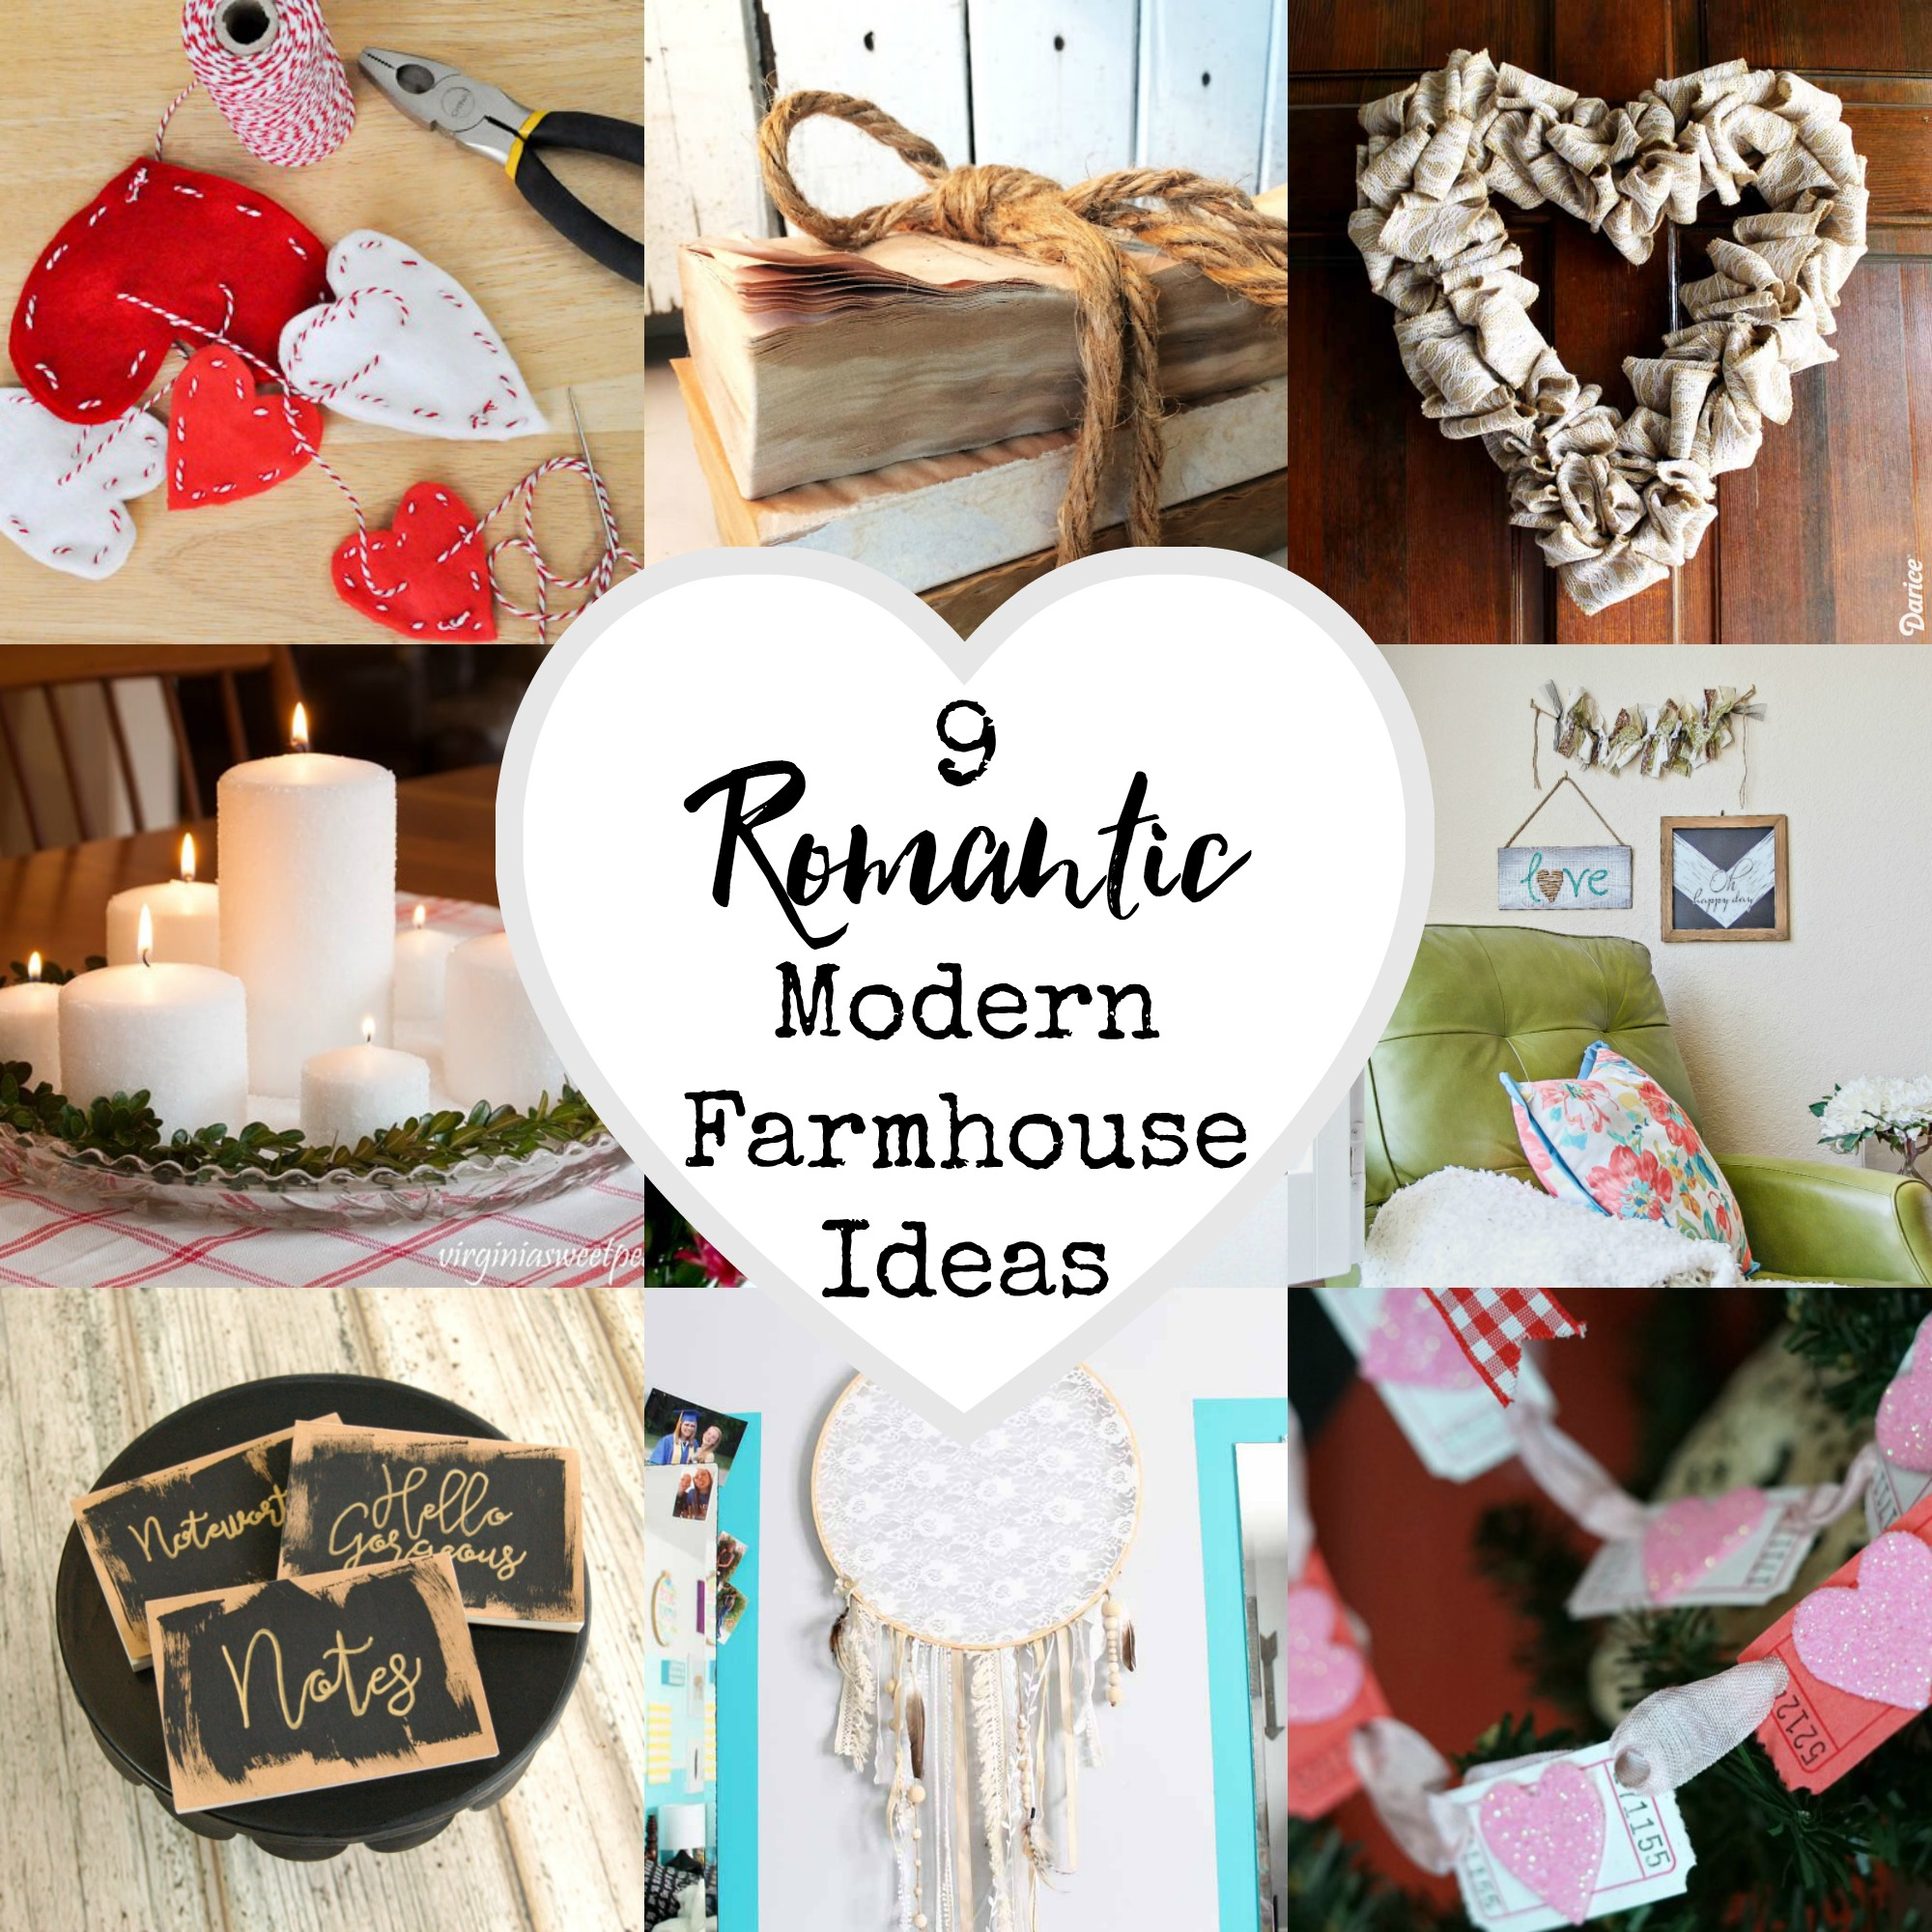 9 Romantic Modern Farmhouse Ideas